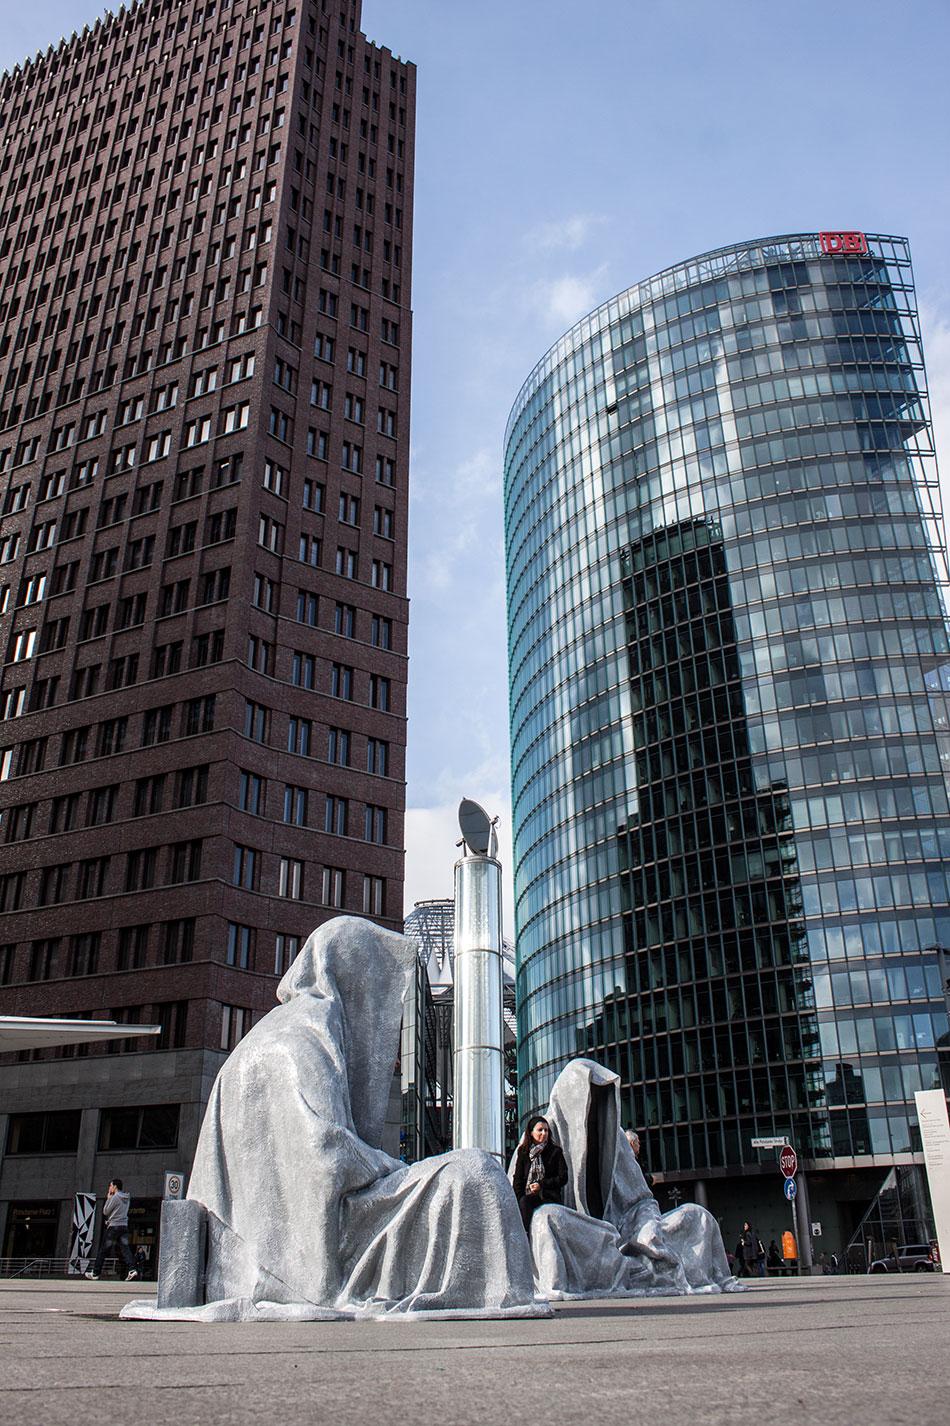 festival-of-lights-berlin-potzdamer-platz-light-art-show-exhibition-lumina-guardians-of-time-manfred-kili-kielnhofer-contemporary-arts-design-sculpture-3067 - Kopie